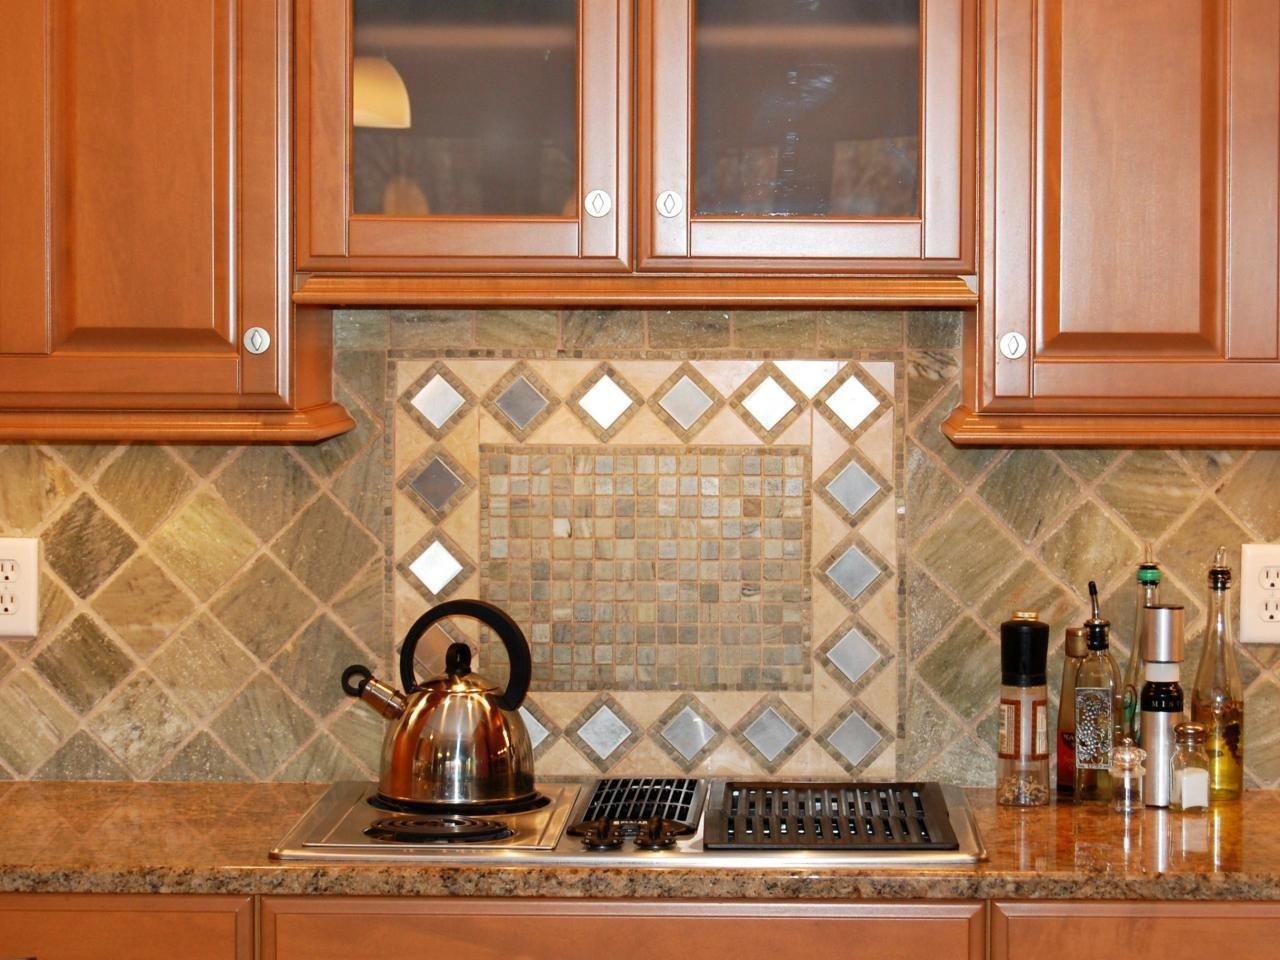 Photos hgtv kitchen tile backsplash ideas pictures tips hgtv kitchen